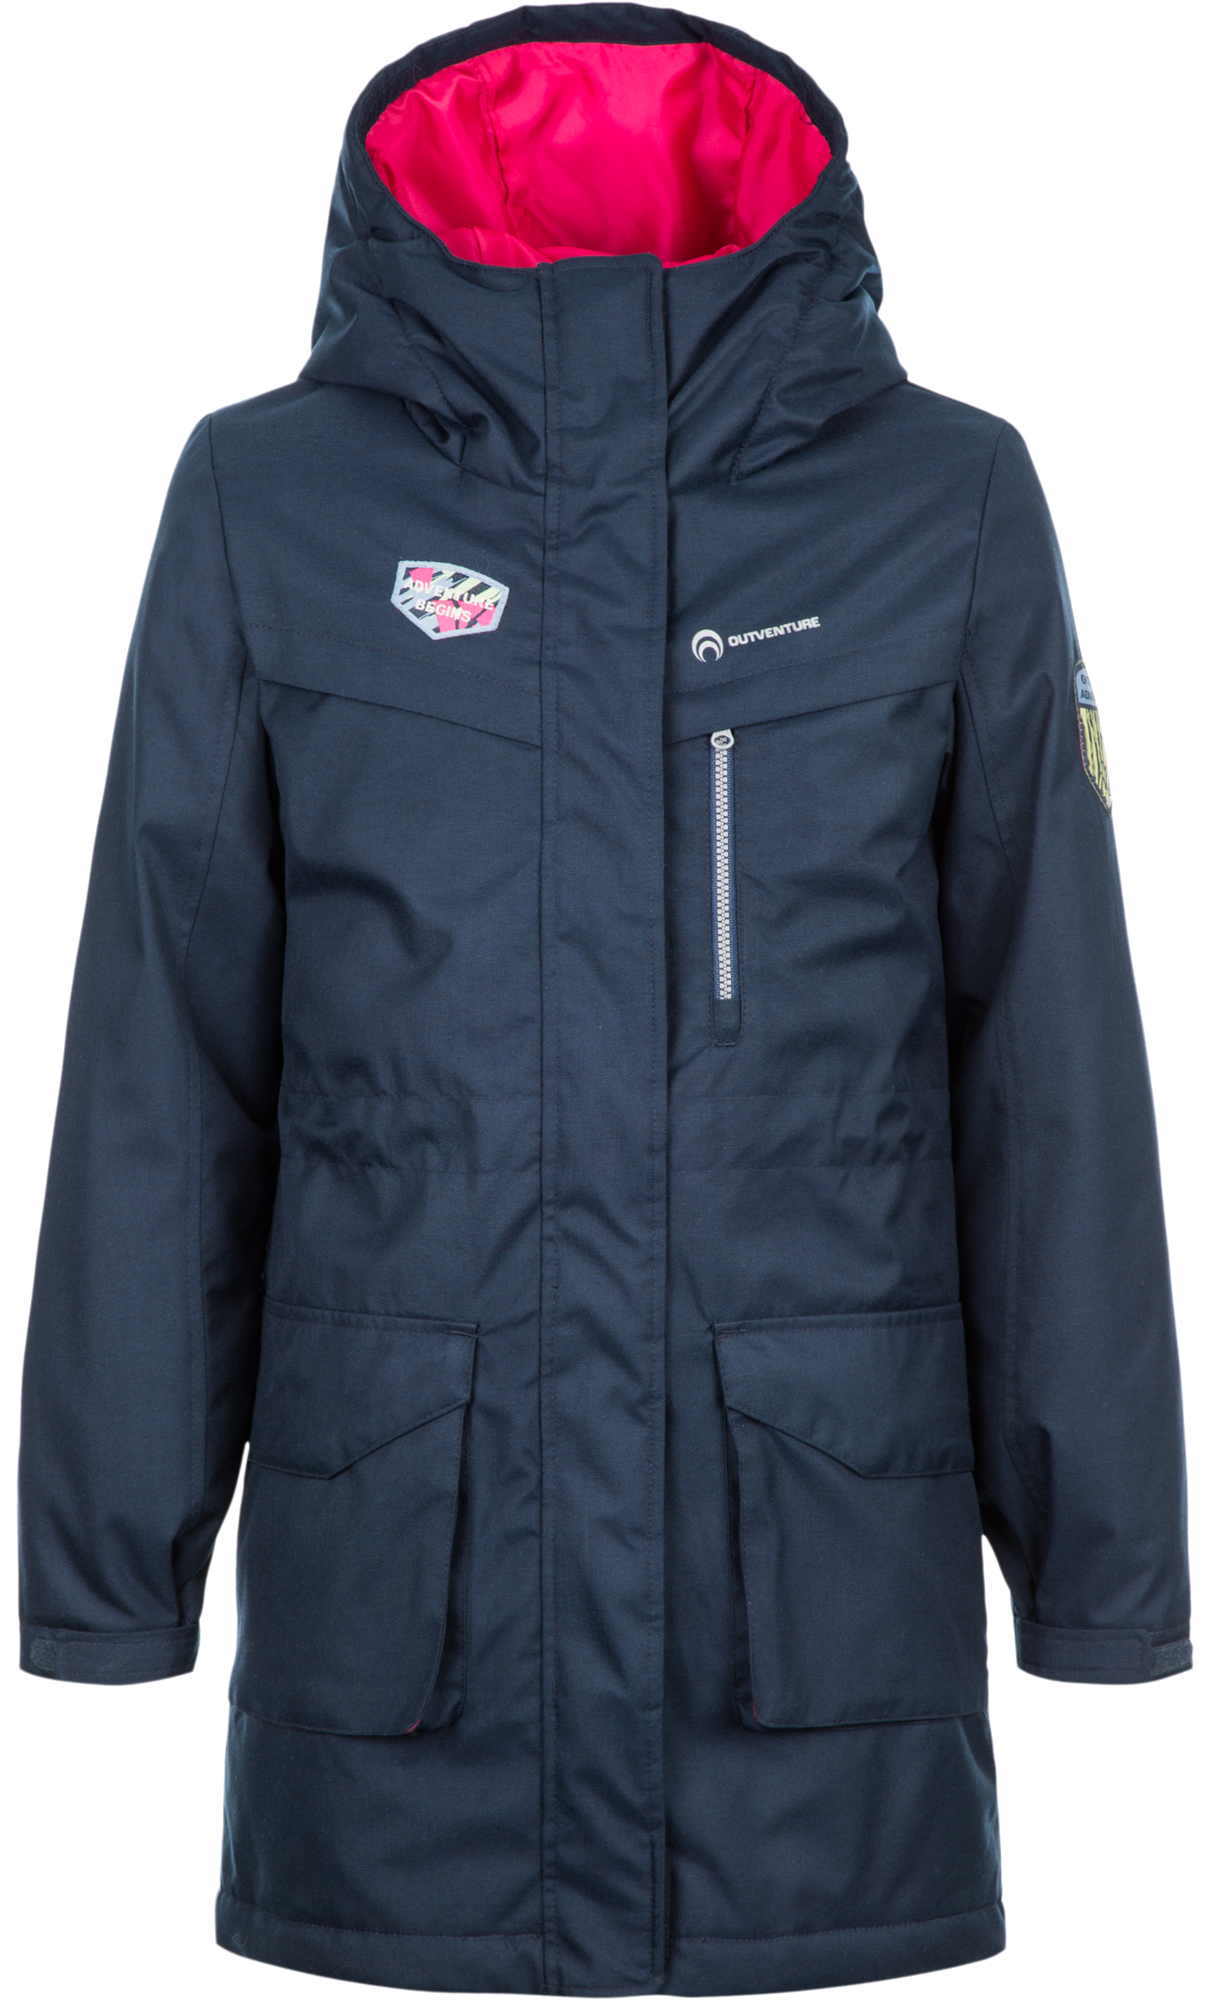 Outventure Куртка утепленная для девочек Outventure, размер 140